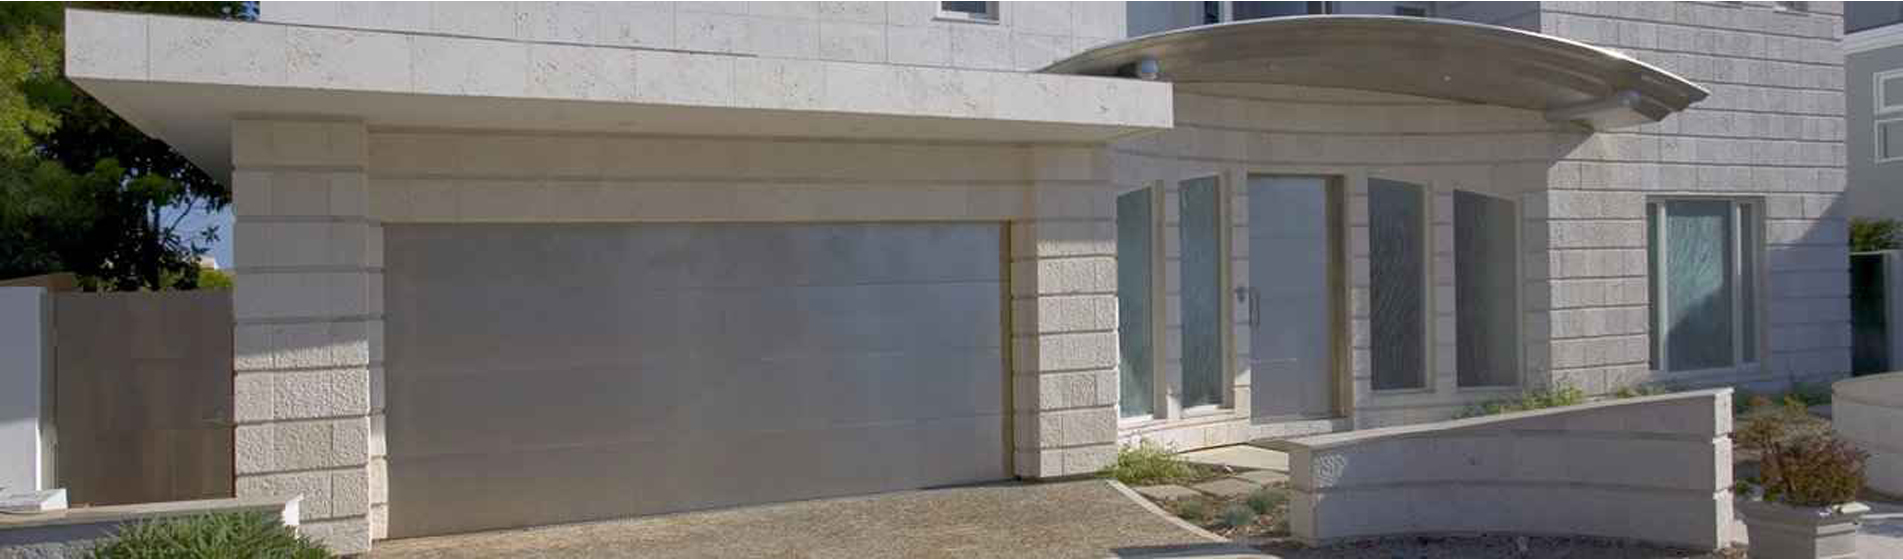 prix porte de garage alu Pertuis